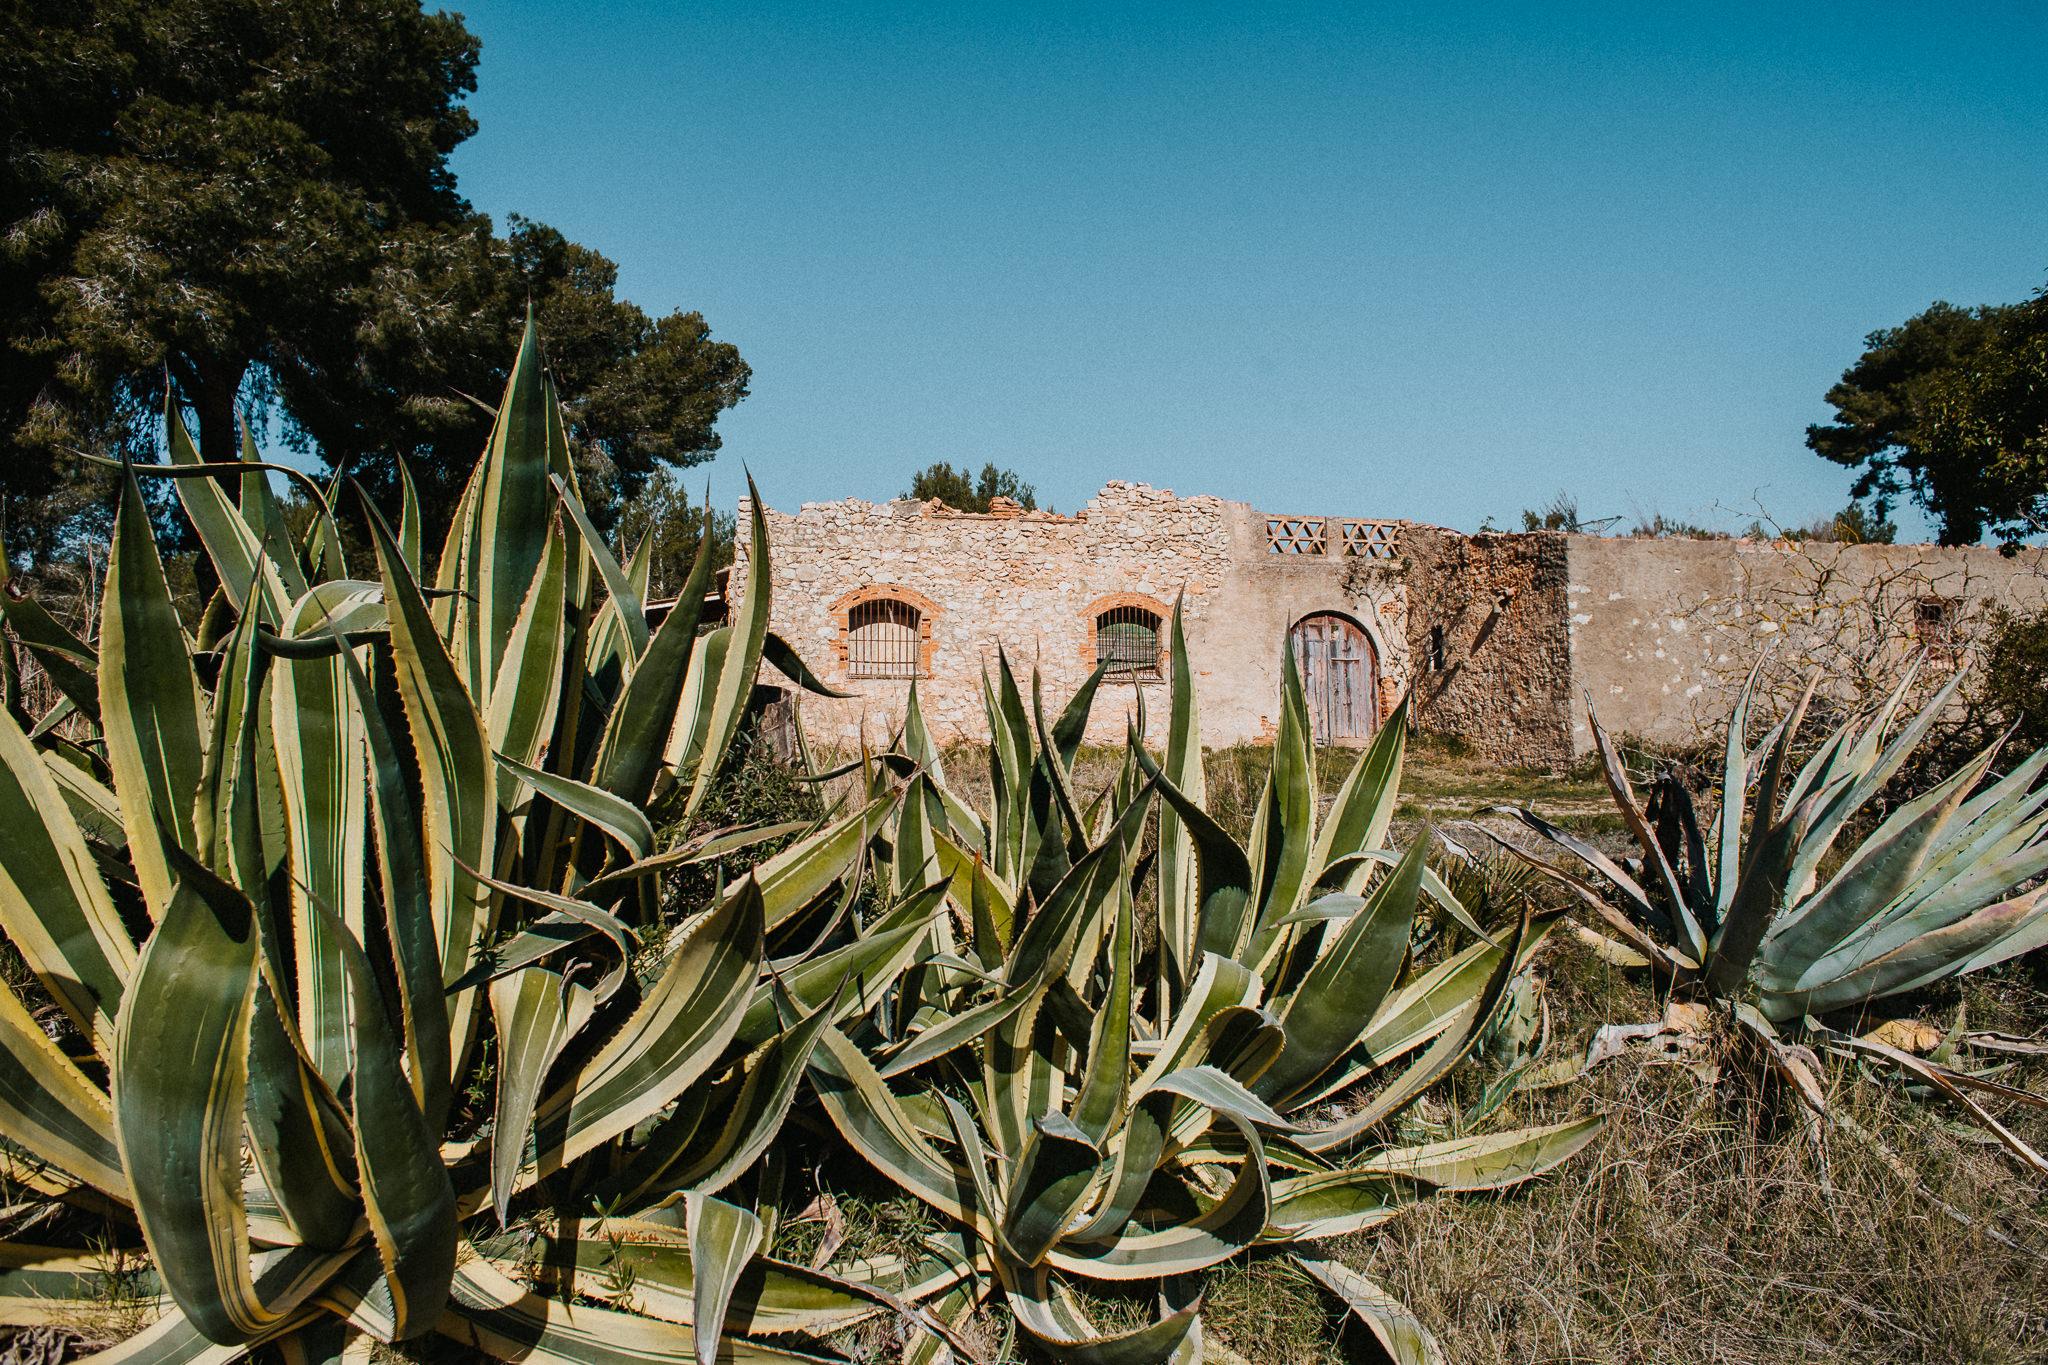 Barcelona-destination-photographer-alfred-tang-94.jpg